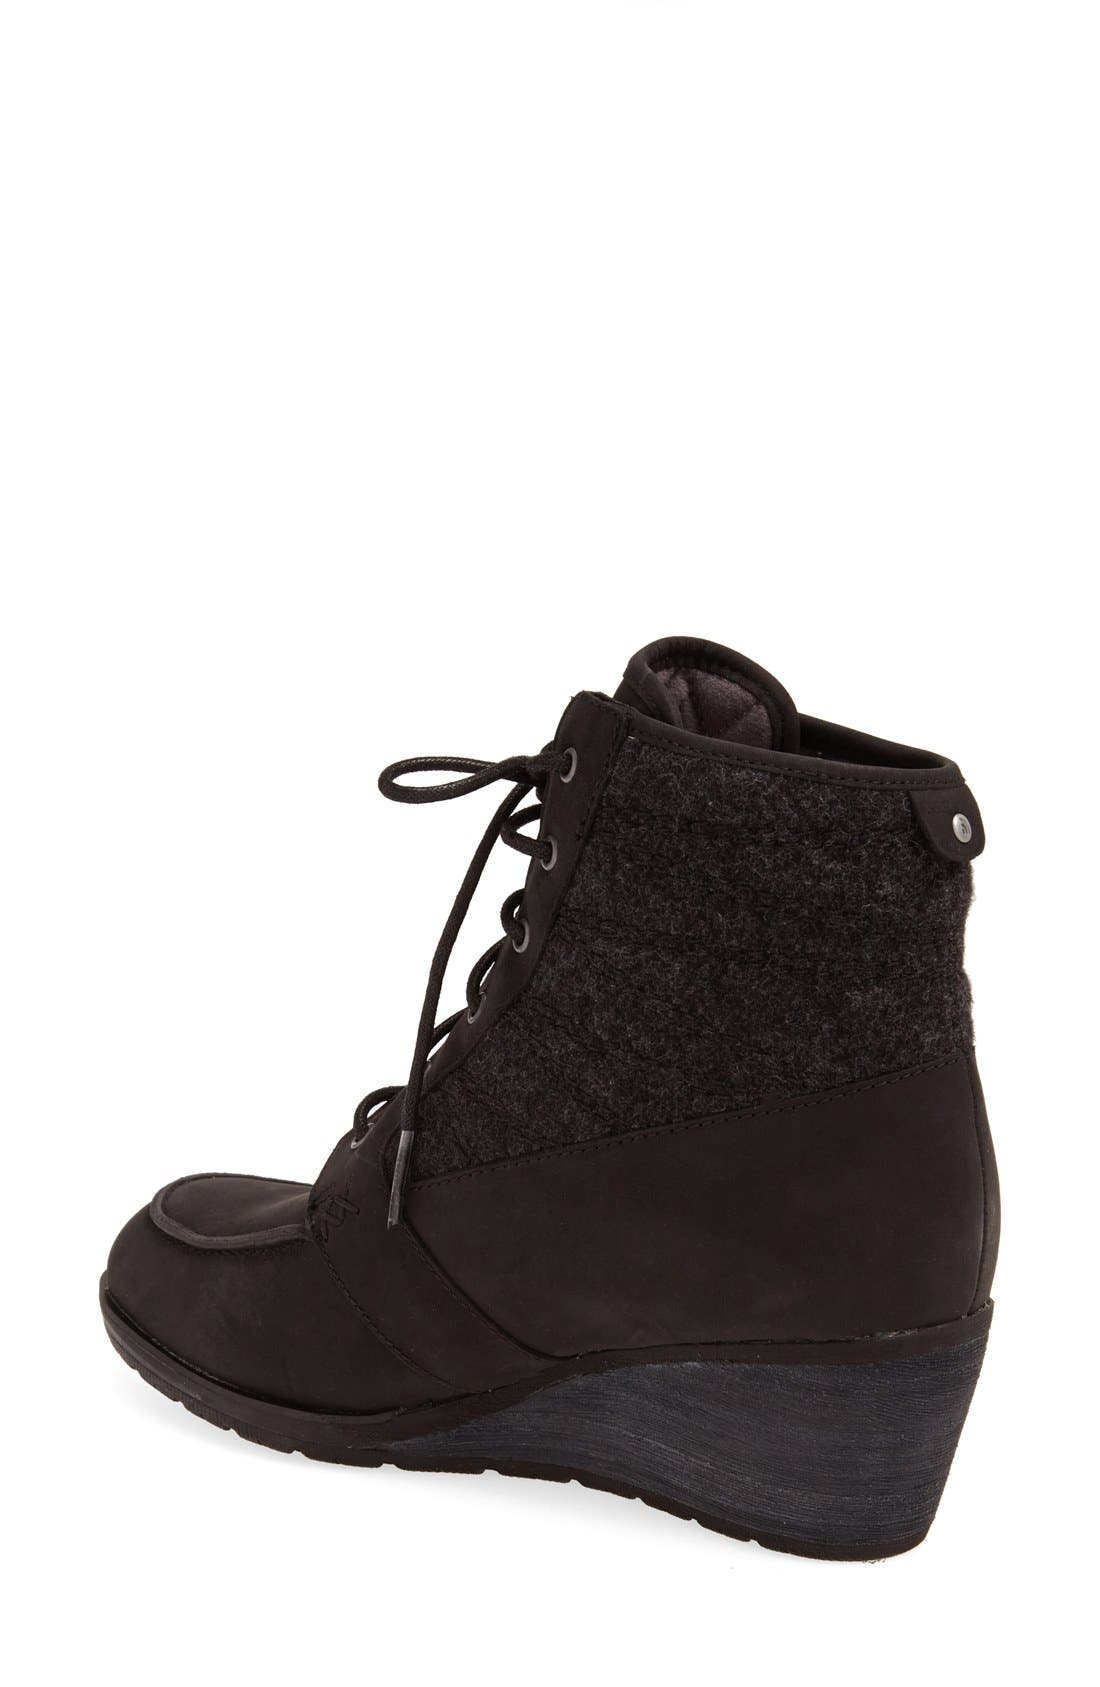 'Bridgeton Wedge Lace' Waterproof Boot,                             Alternate thumbnail 4, color,                             001